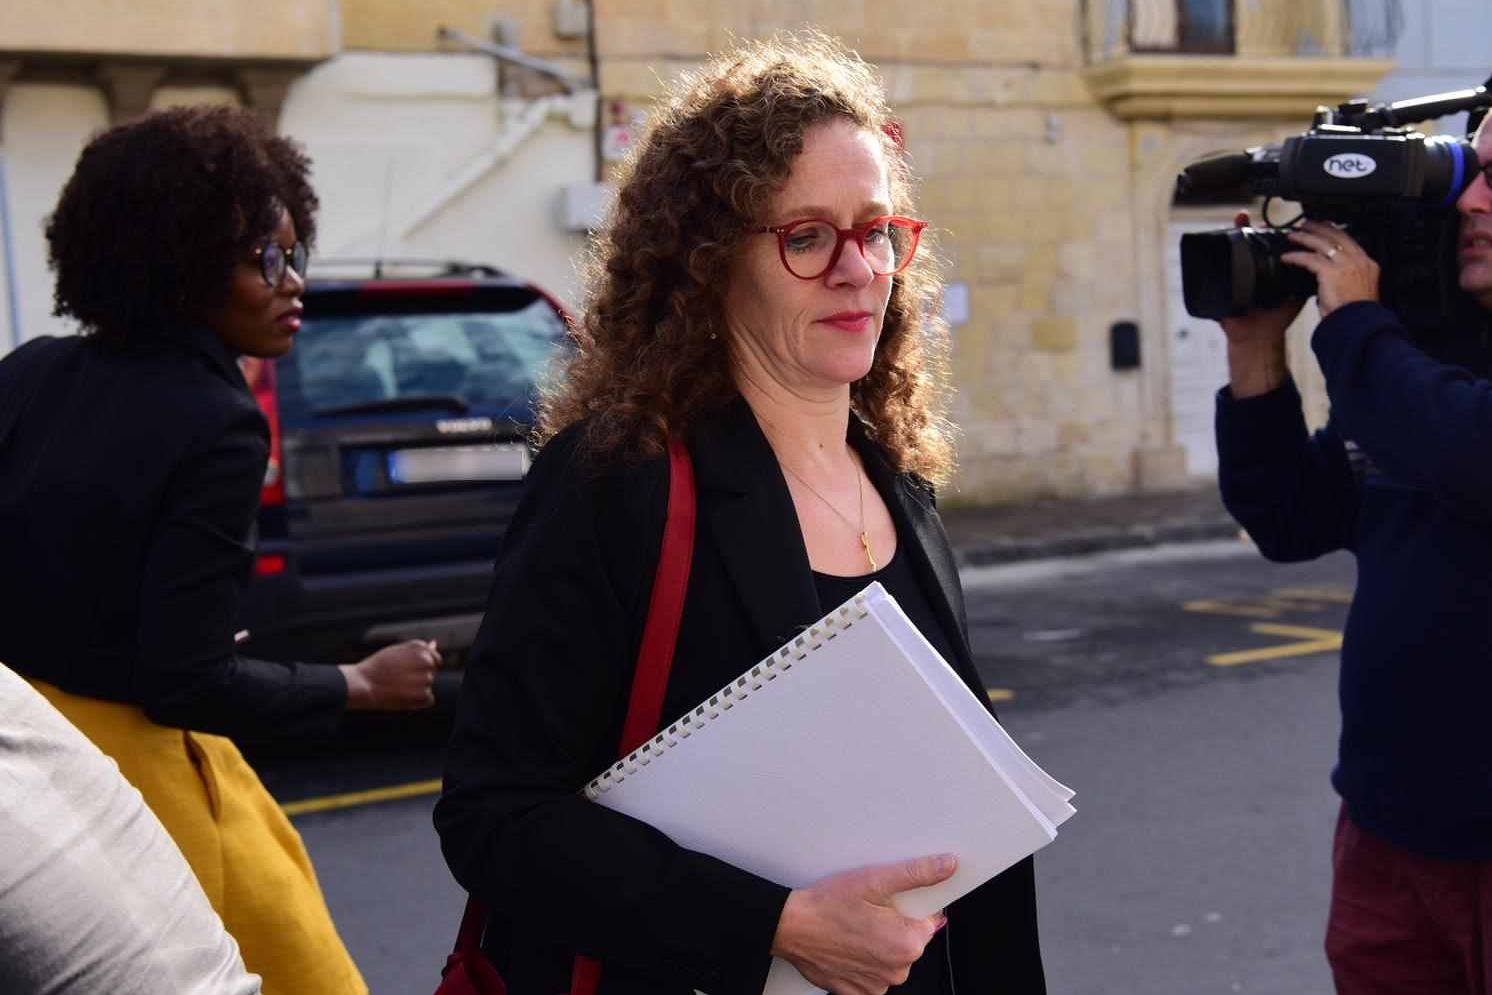 MEP Sophie in't Veld walks towards police headquarters, with MEP Assita Kanko behind her on the left.